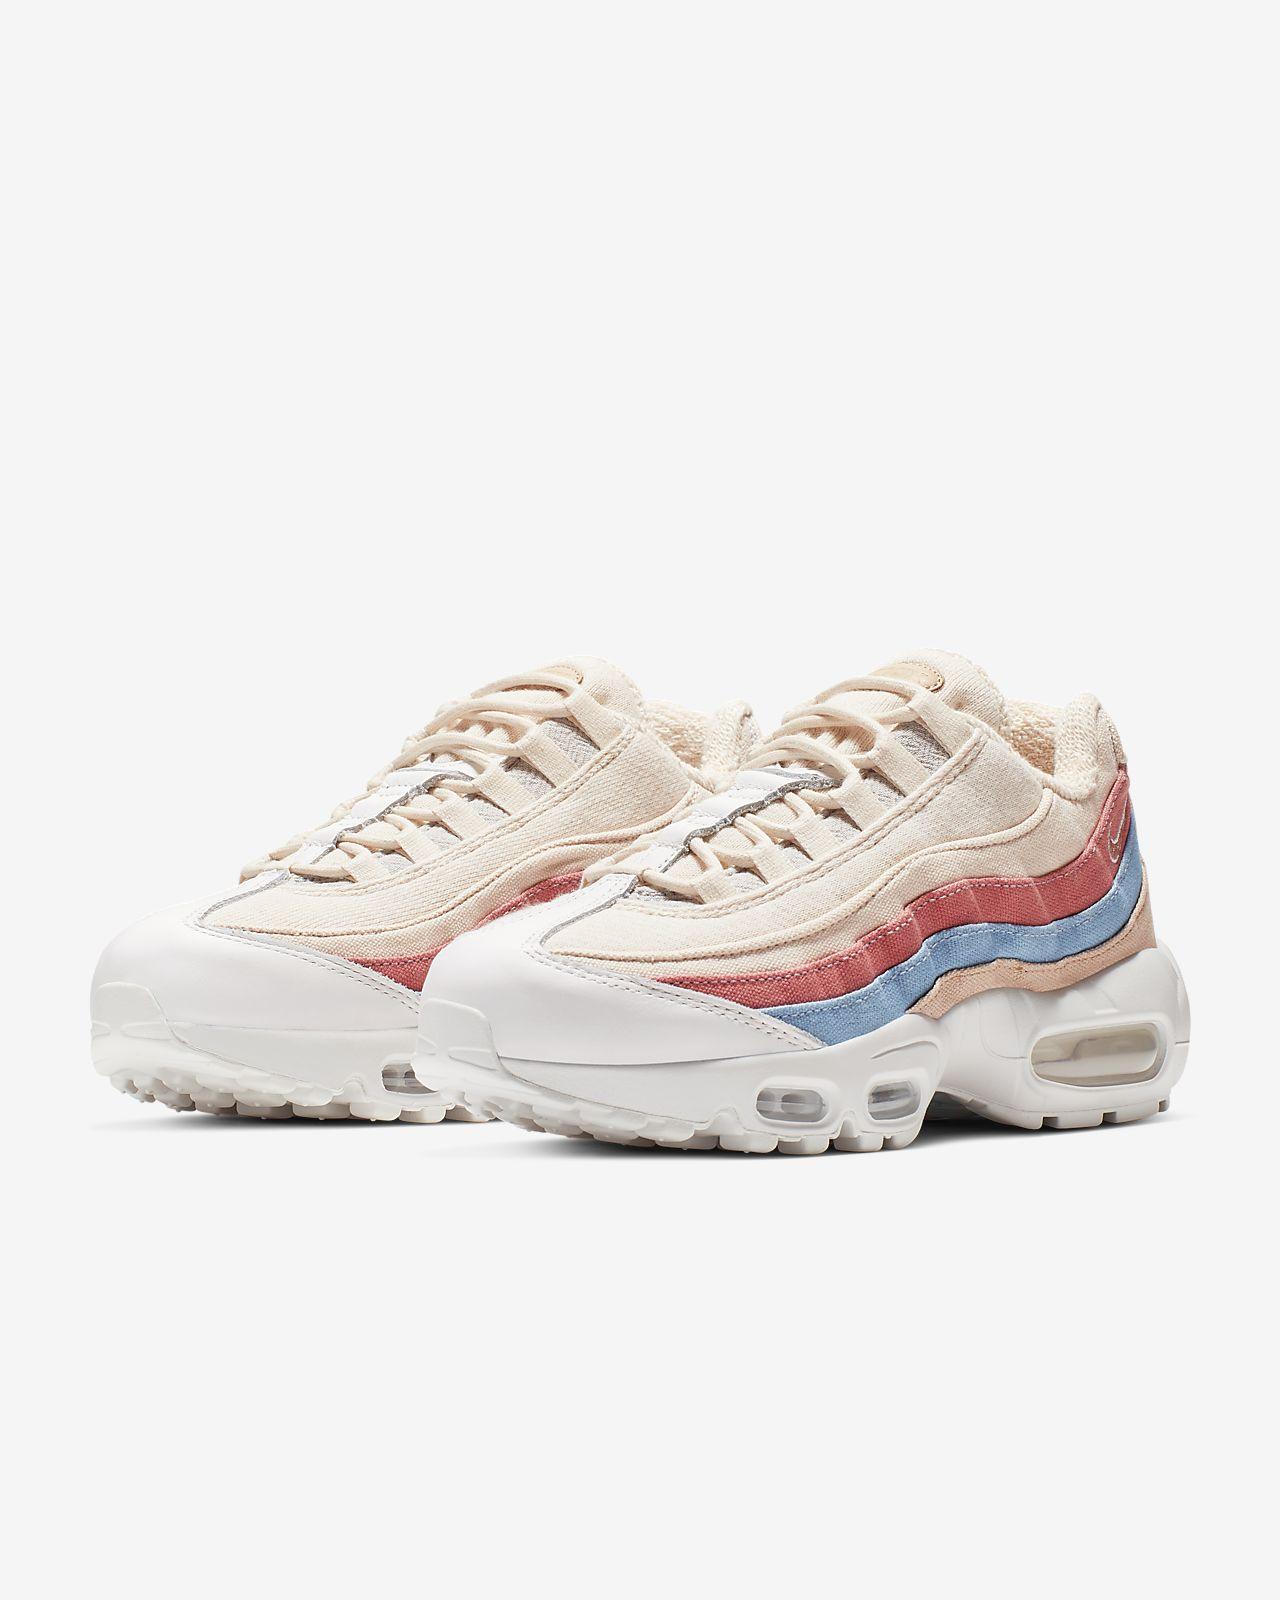 hot sale online 6c755 7a3e7 ... Nike Air Max 95 QS Women s Shoe